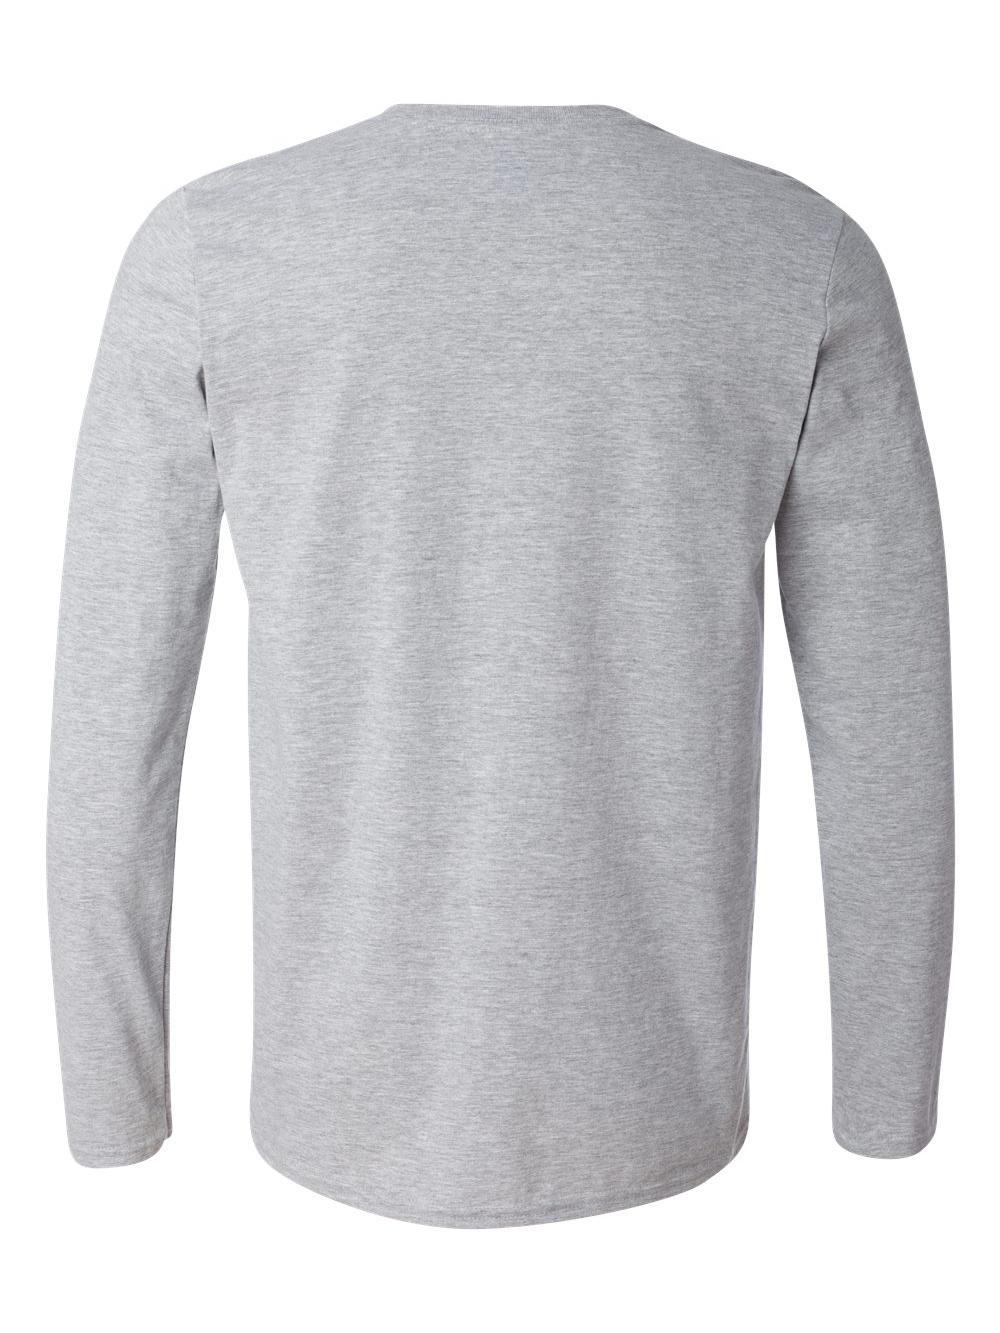 Gildan-Softstyle-Long-Sleeve-T-Shirt-64400 thumbnail 19